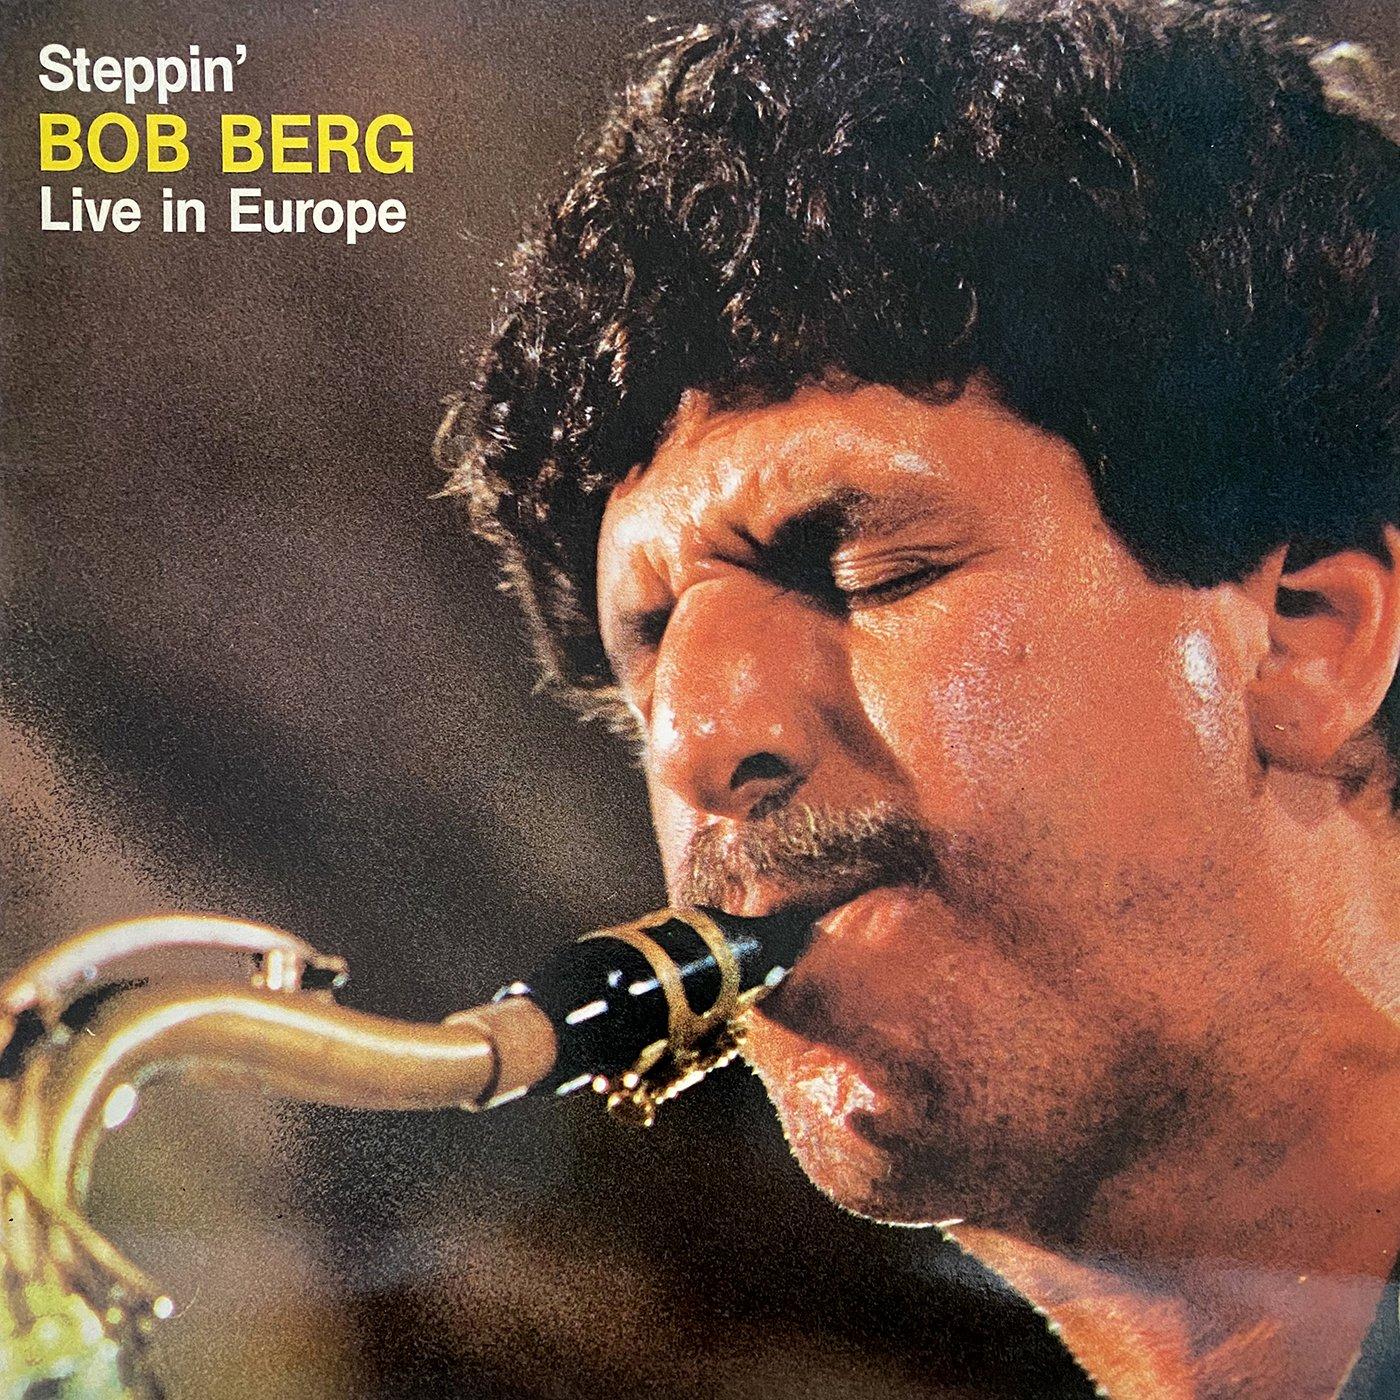 Steppin' Live In Europe - Bob Berg